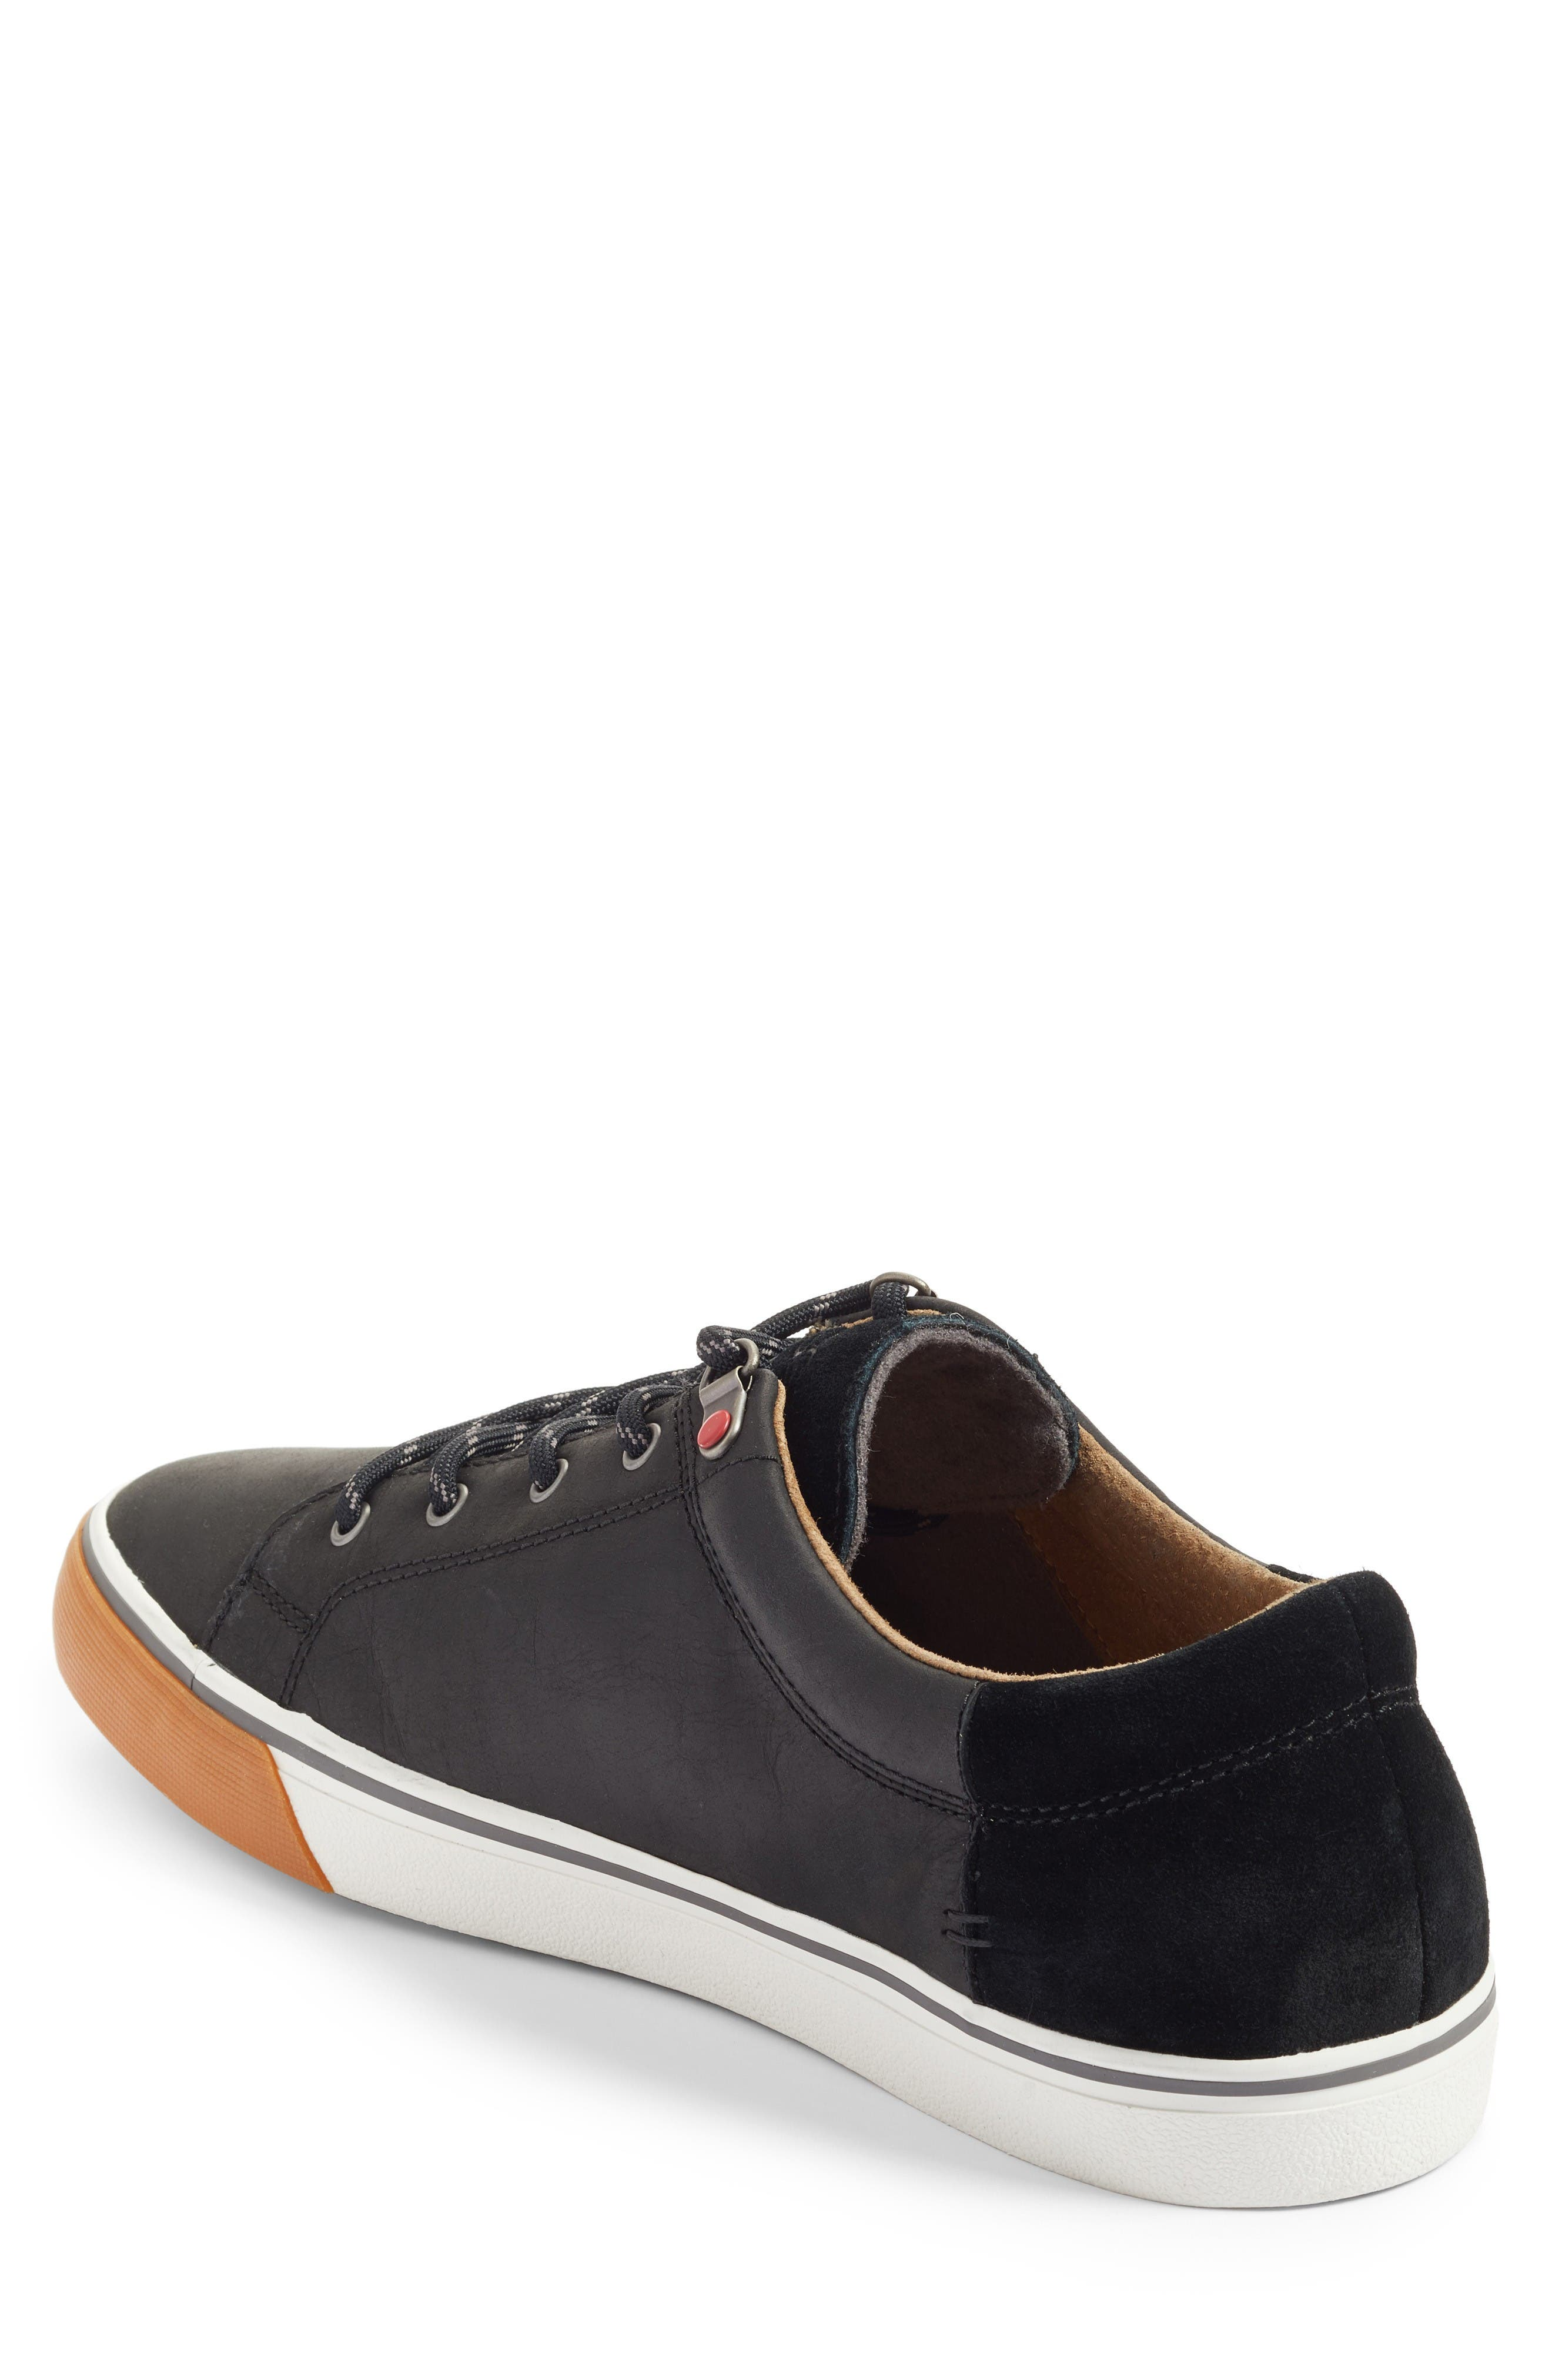 Brock Sneaker,                             Alternate thumbnail 2, color,                             Black